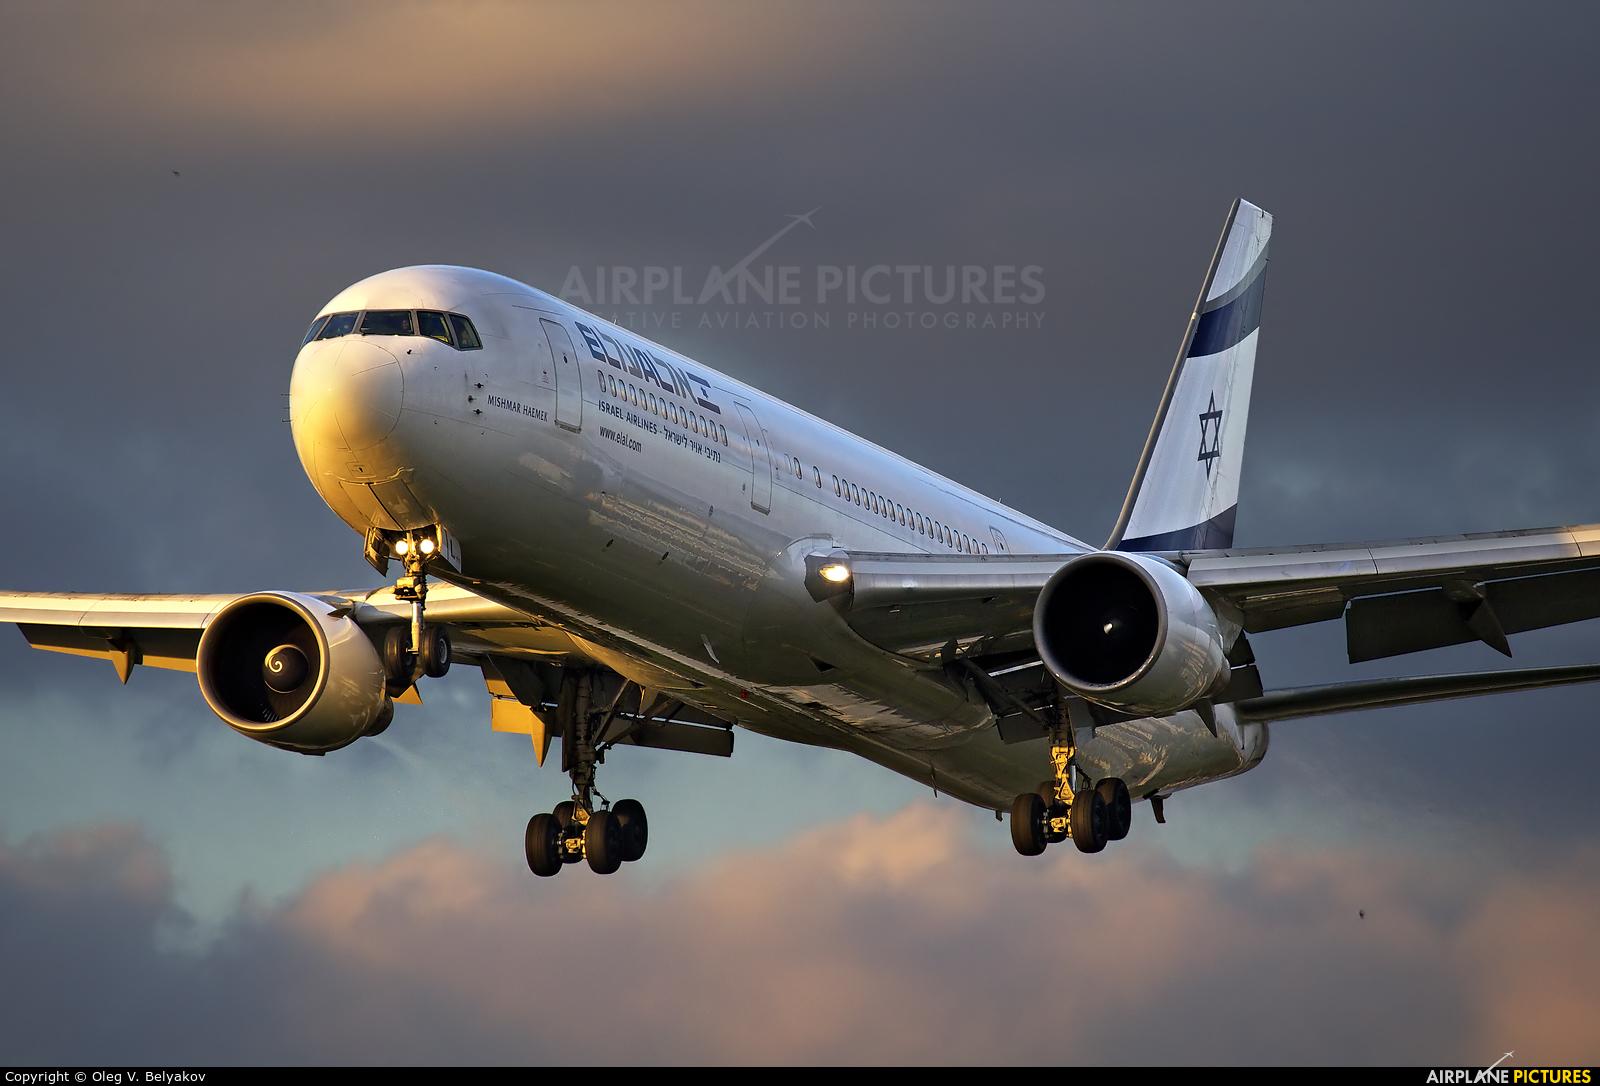 El Al Israel Airlines 4X-EAL aircraft at London - Heathrow